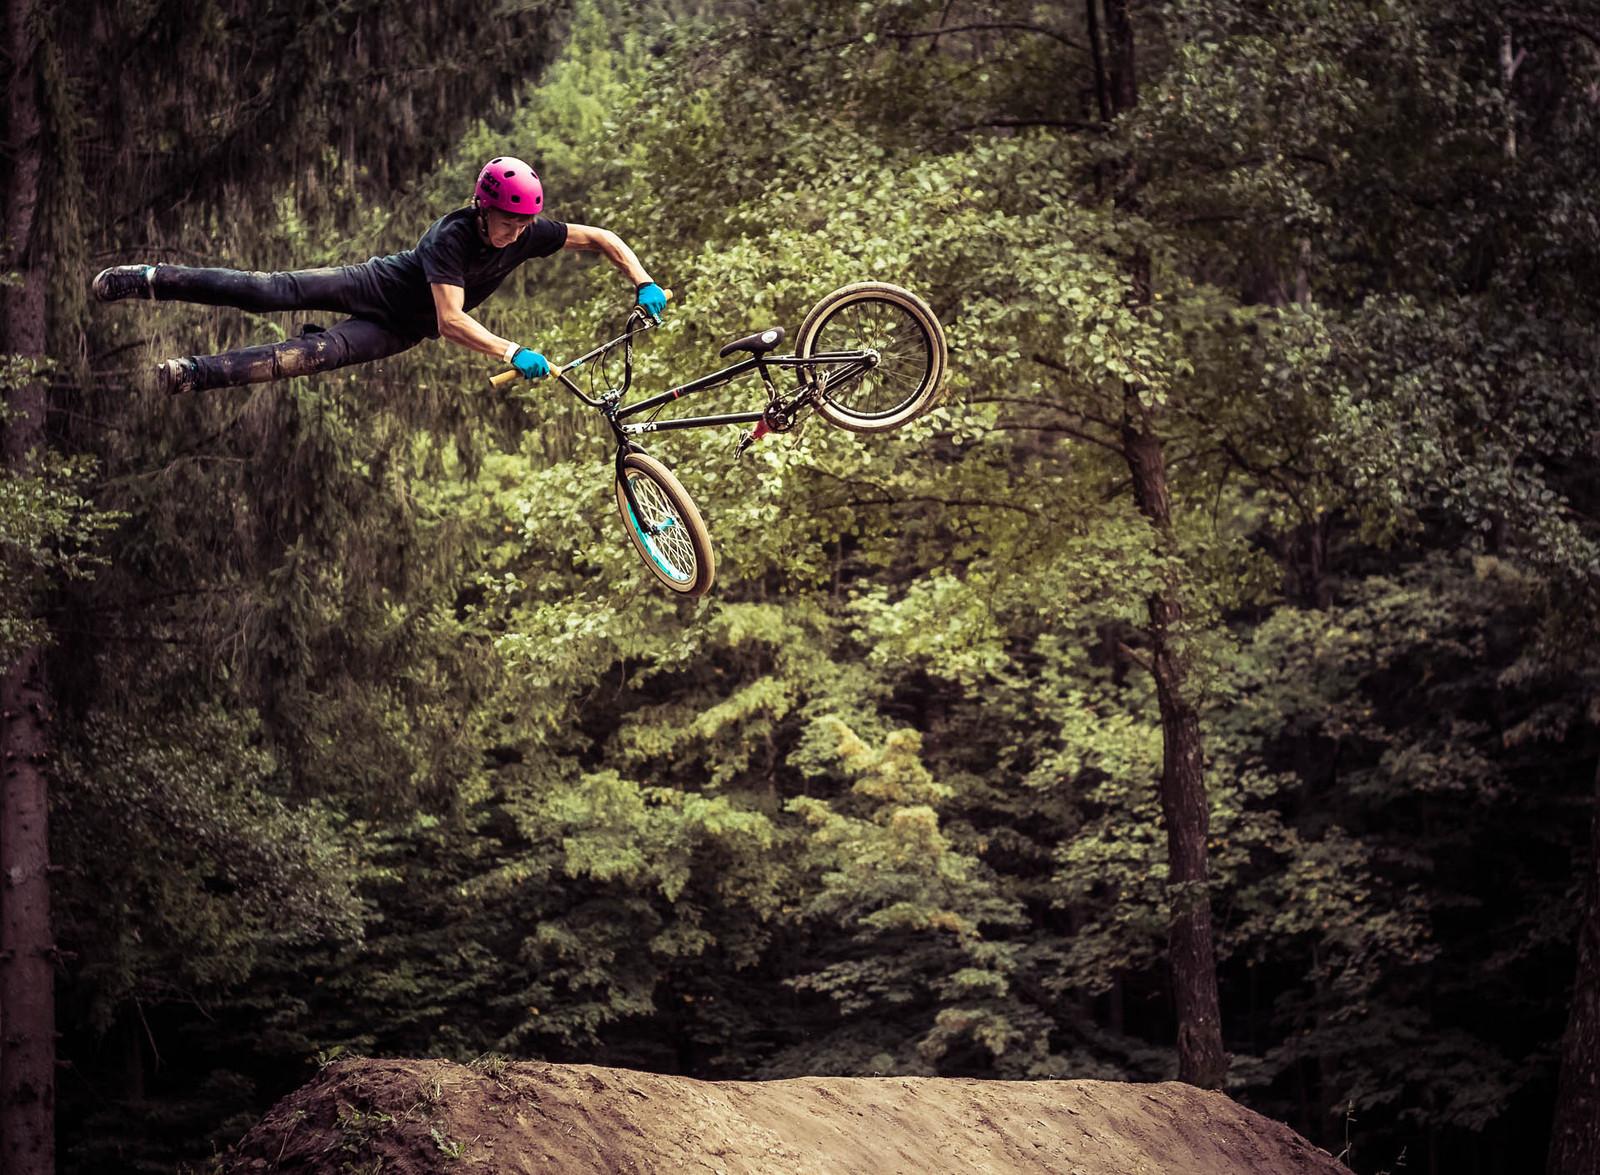 Wild Ride I - berto - Mountain Biking Pictures - Vital MTB